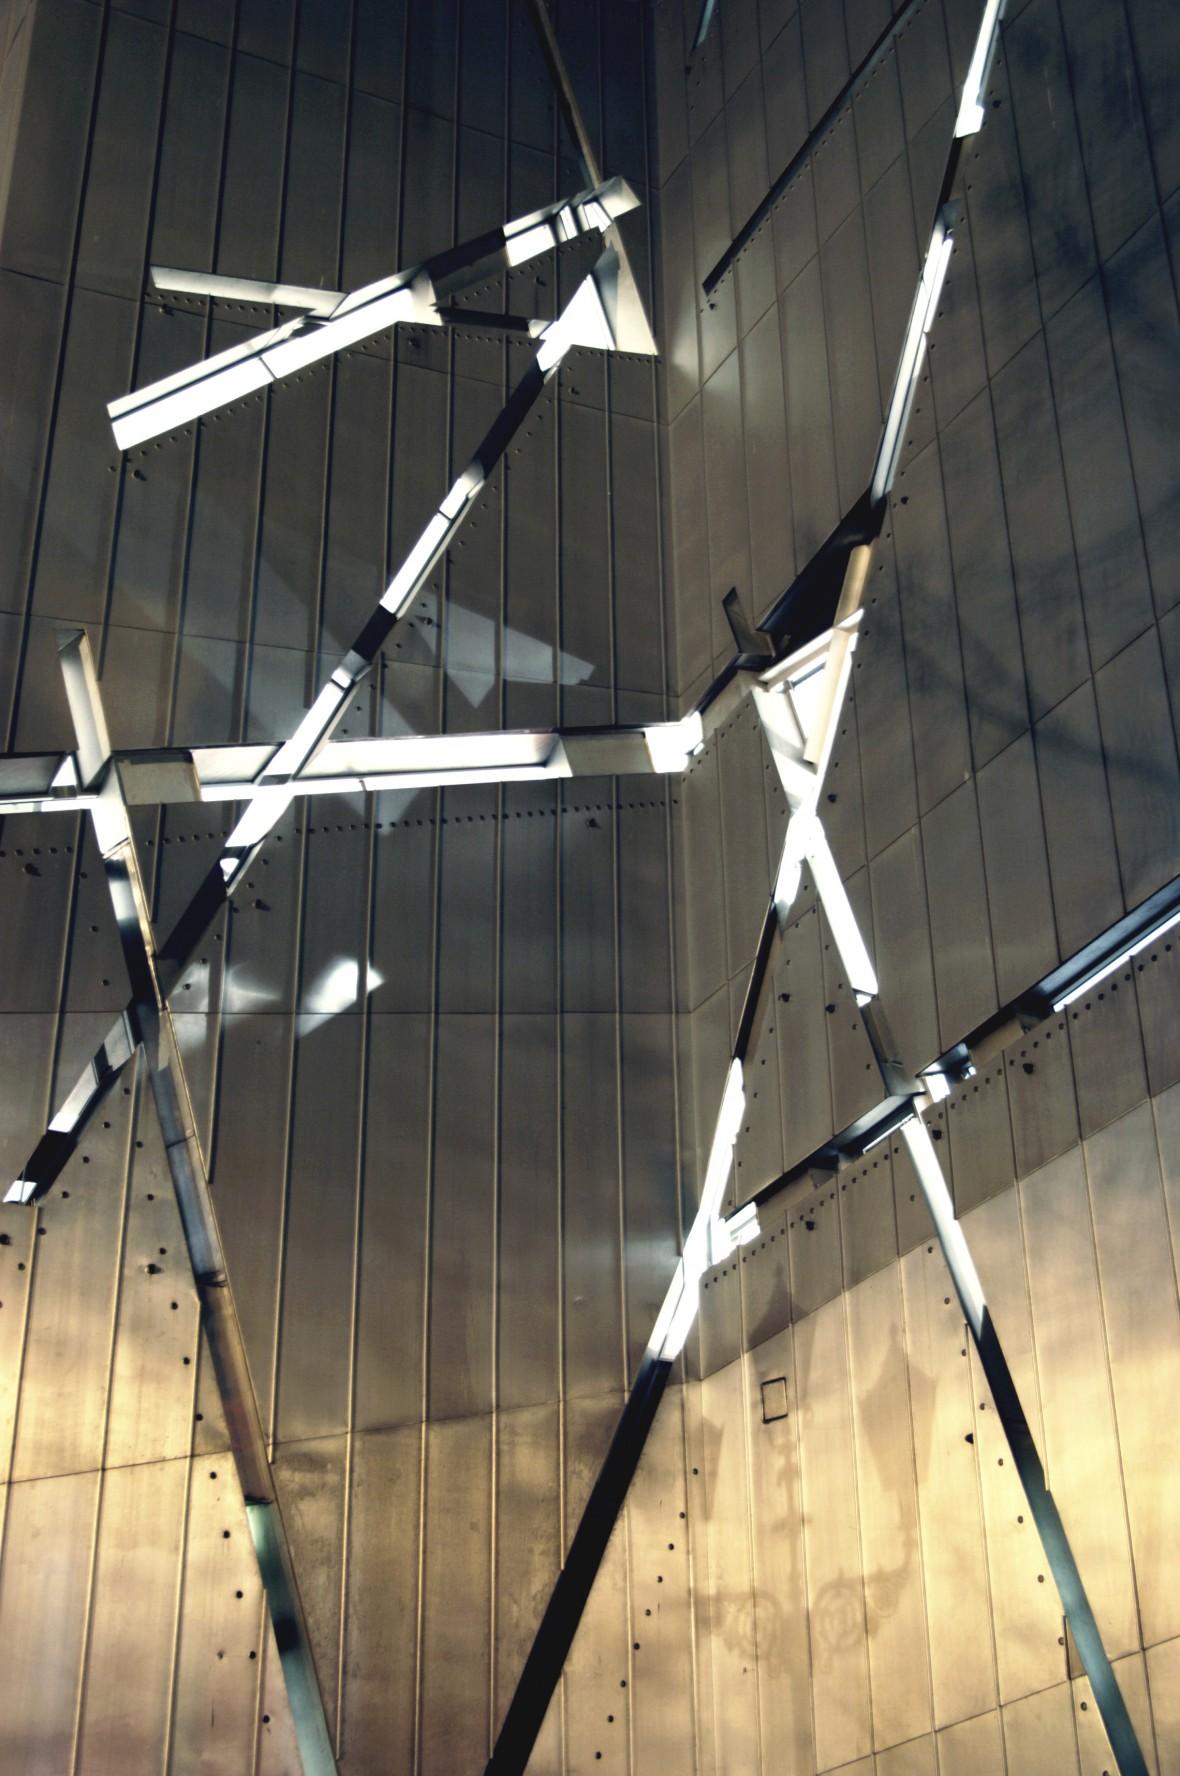 exterior-star-of-david-matrix-window-cuts-c-michele-nastasi-2280x3432